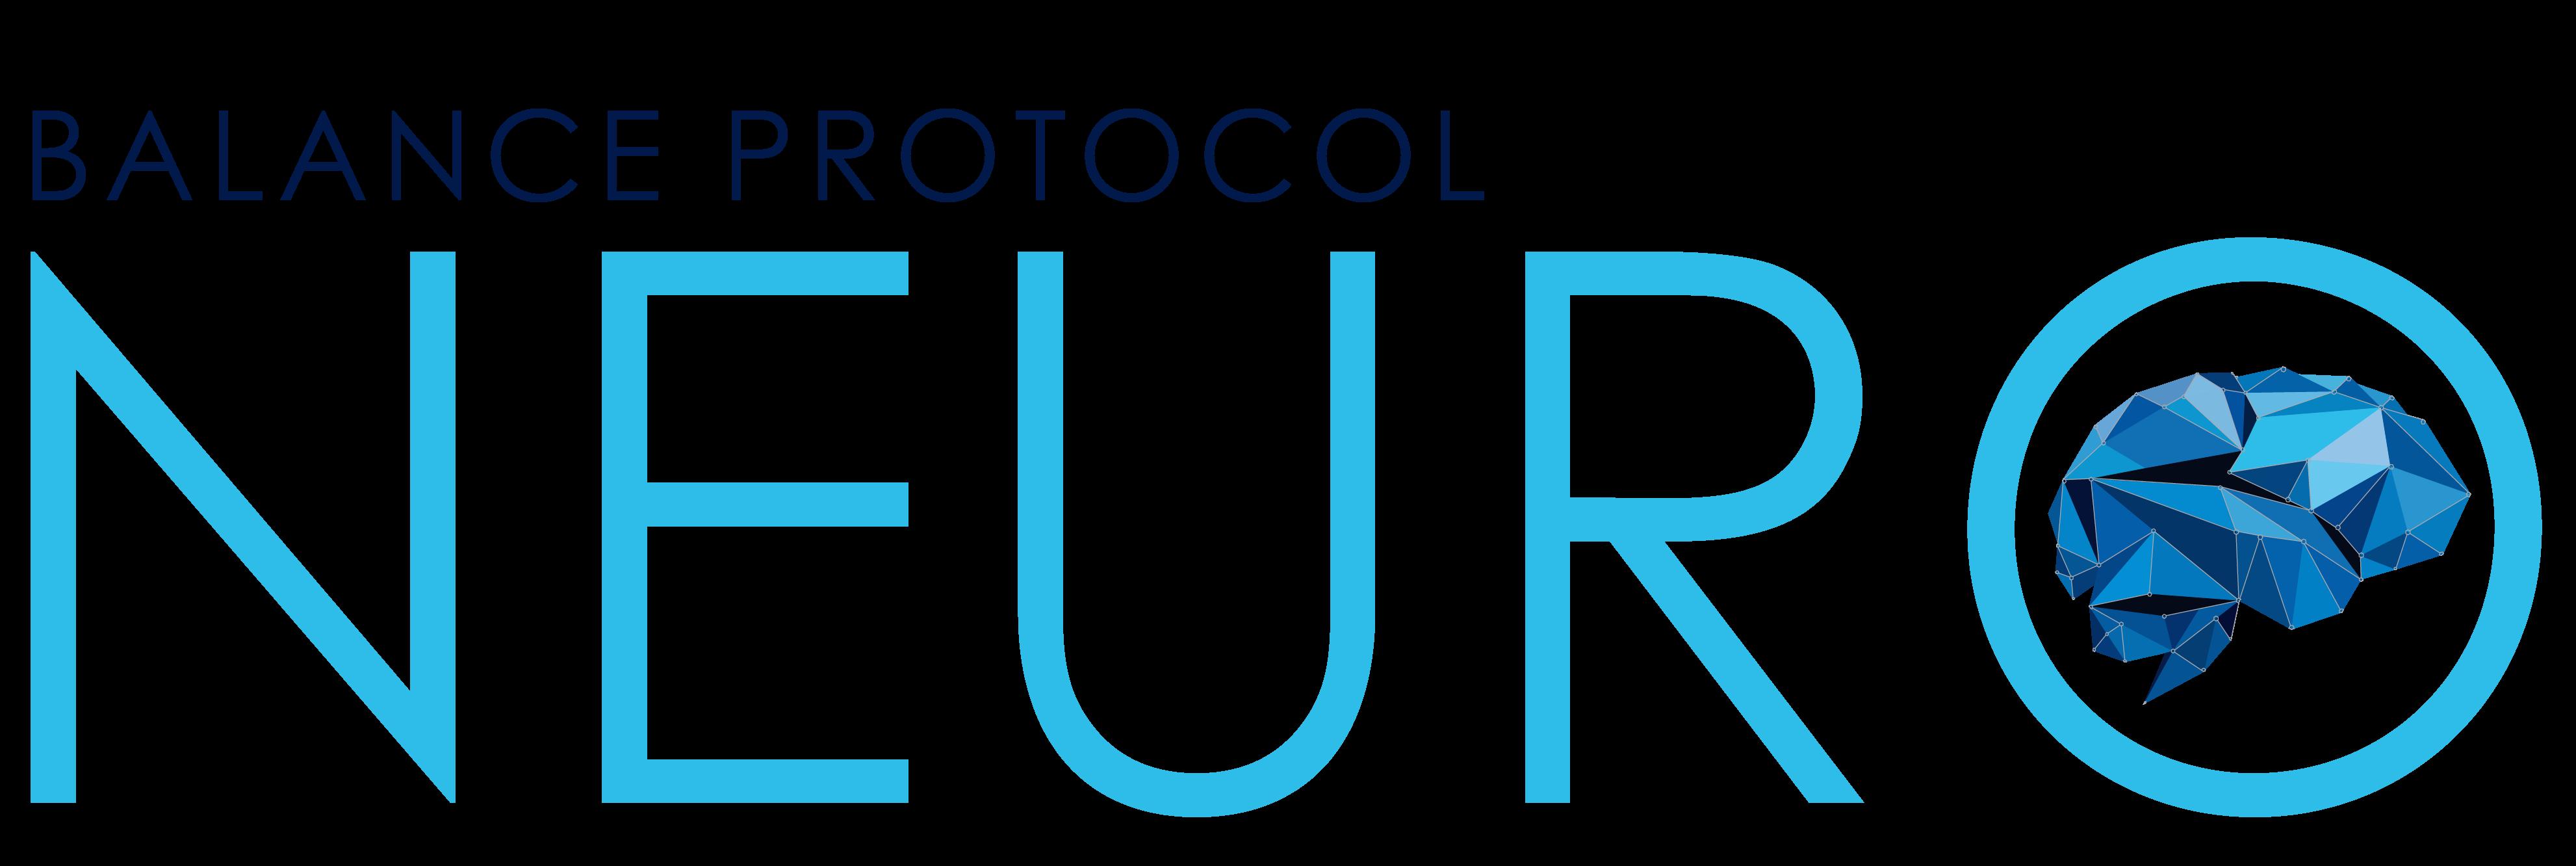 Balance Protocol NEURO